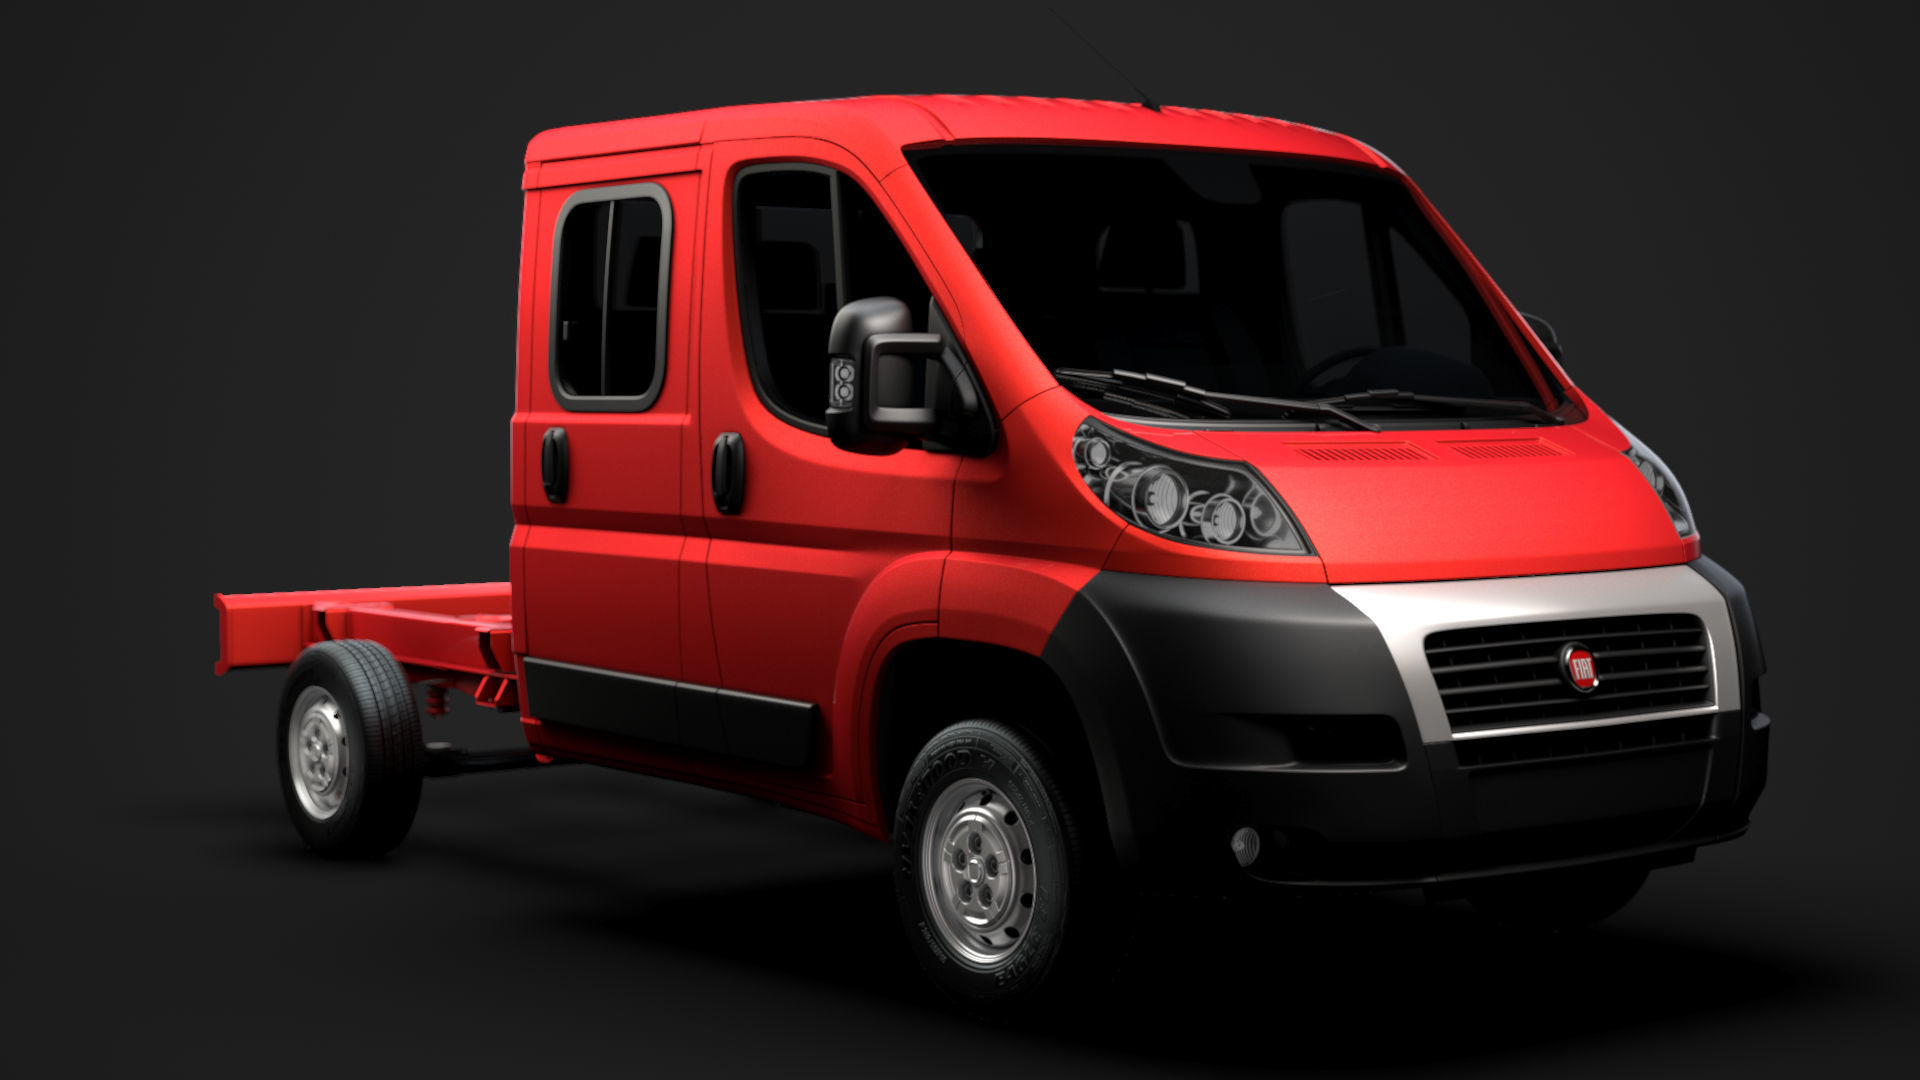 Fiat Ducato Chassis Truck Crew Cab 3450 WB 2014